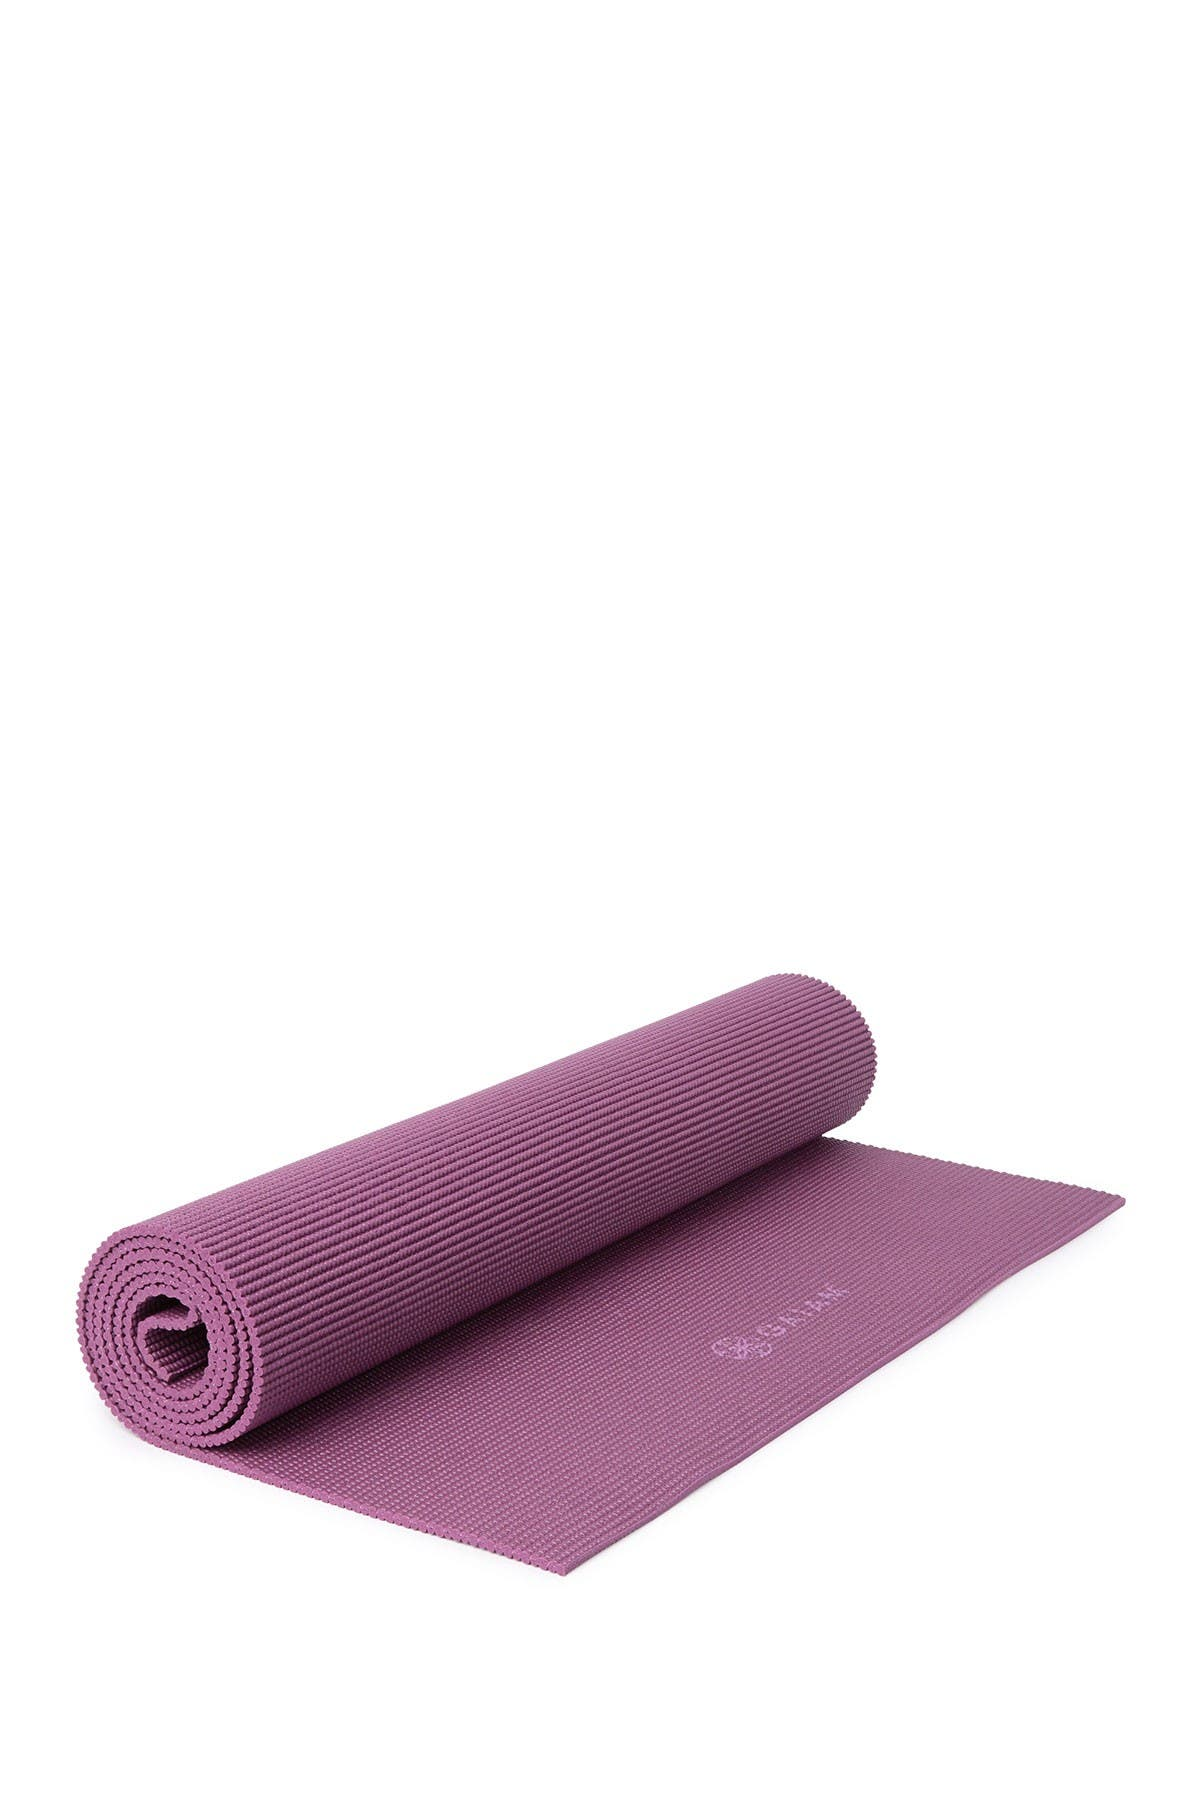 Image of Gaiam 5mm Solid Yoga Mat - Purple